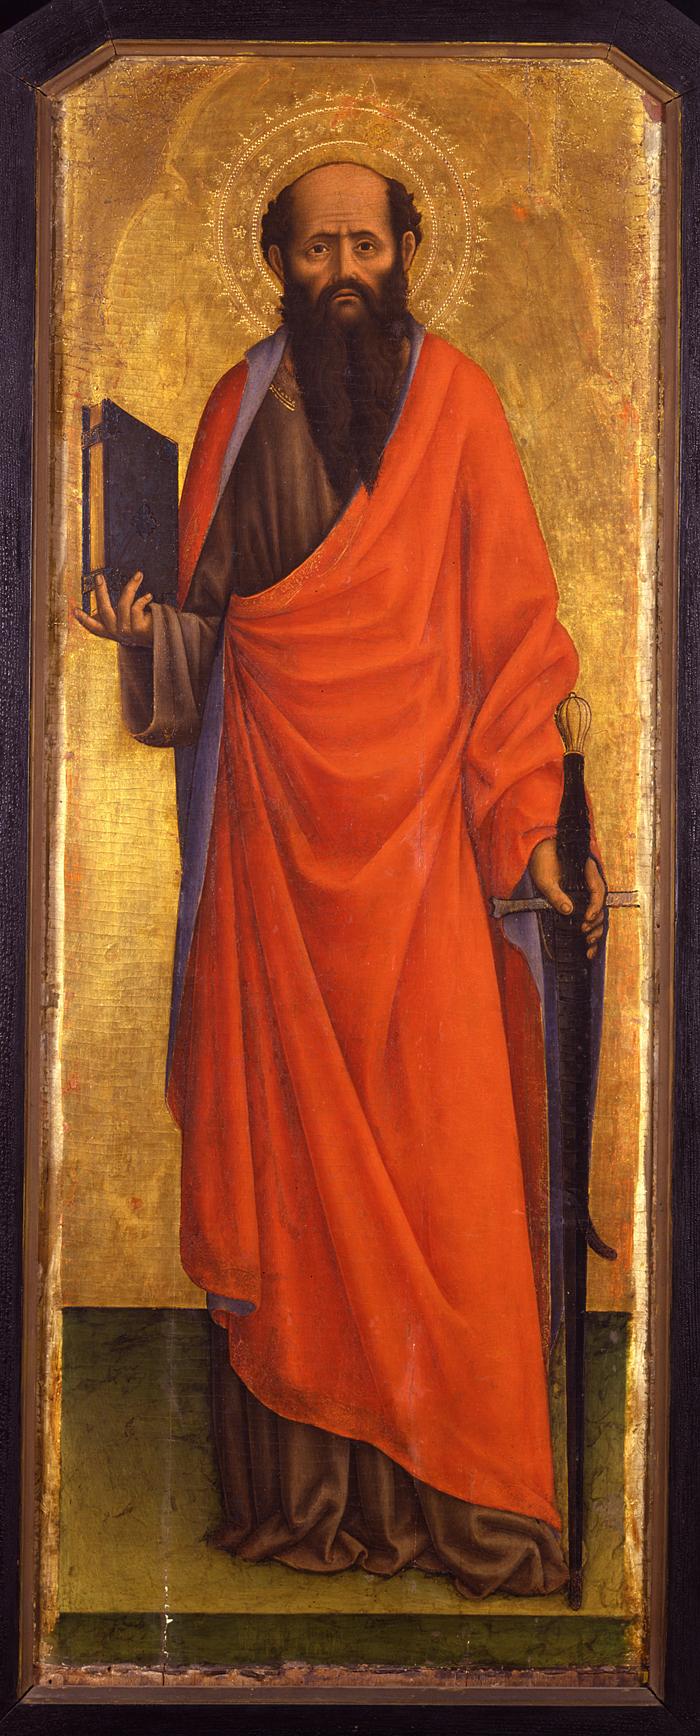 San Paolo raffigurato da Vivarini. Calvizie, spada e libro, i suoi principali attributi